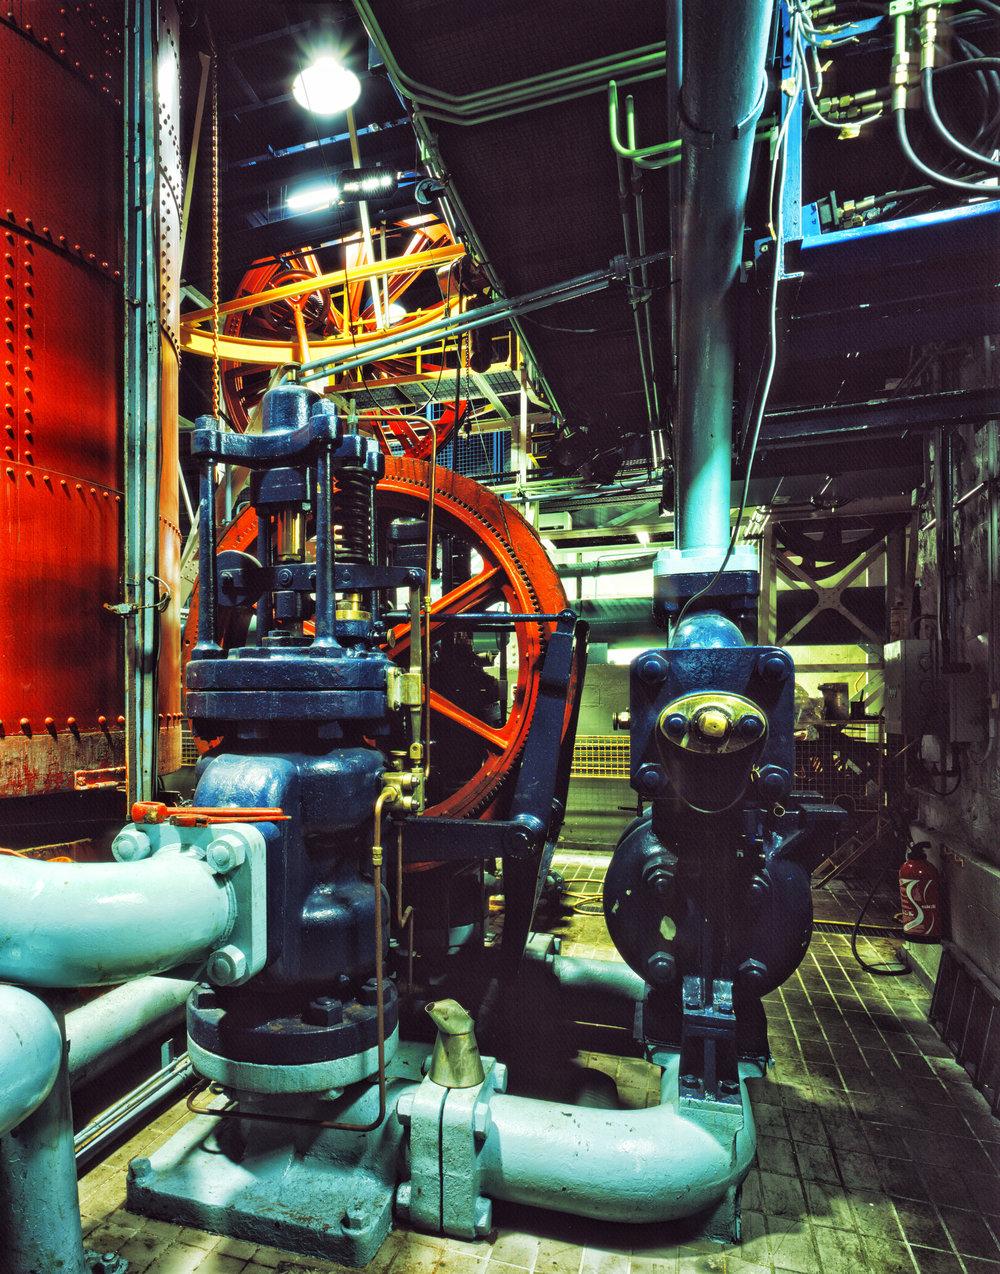 Tour Eiffel - Machinery